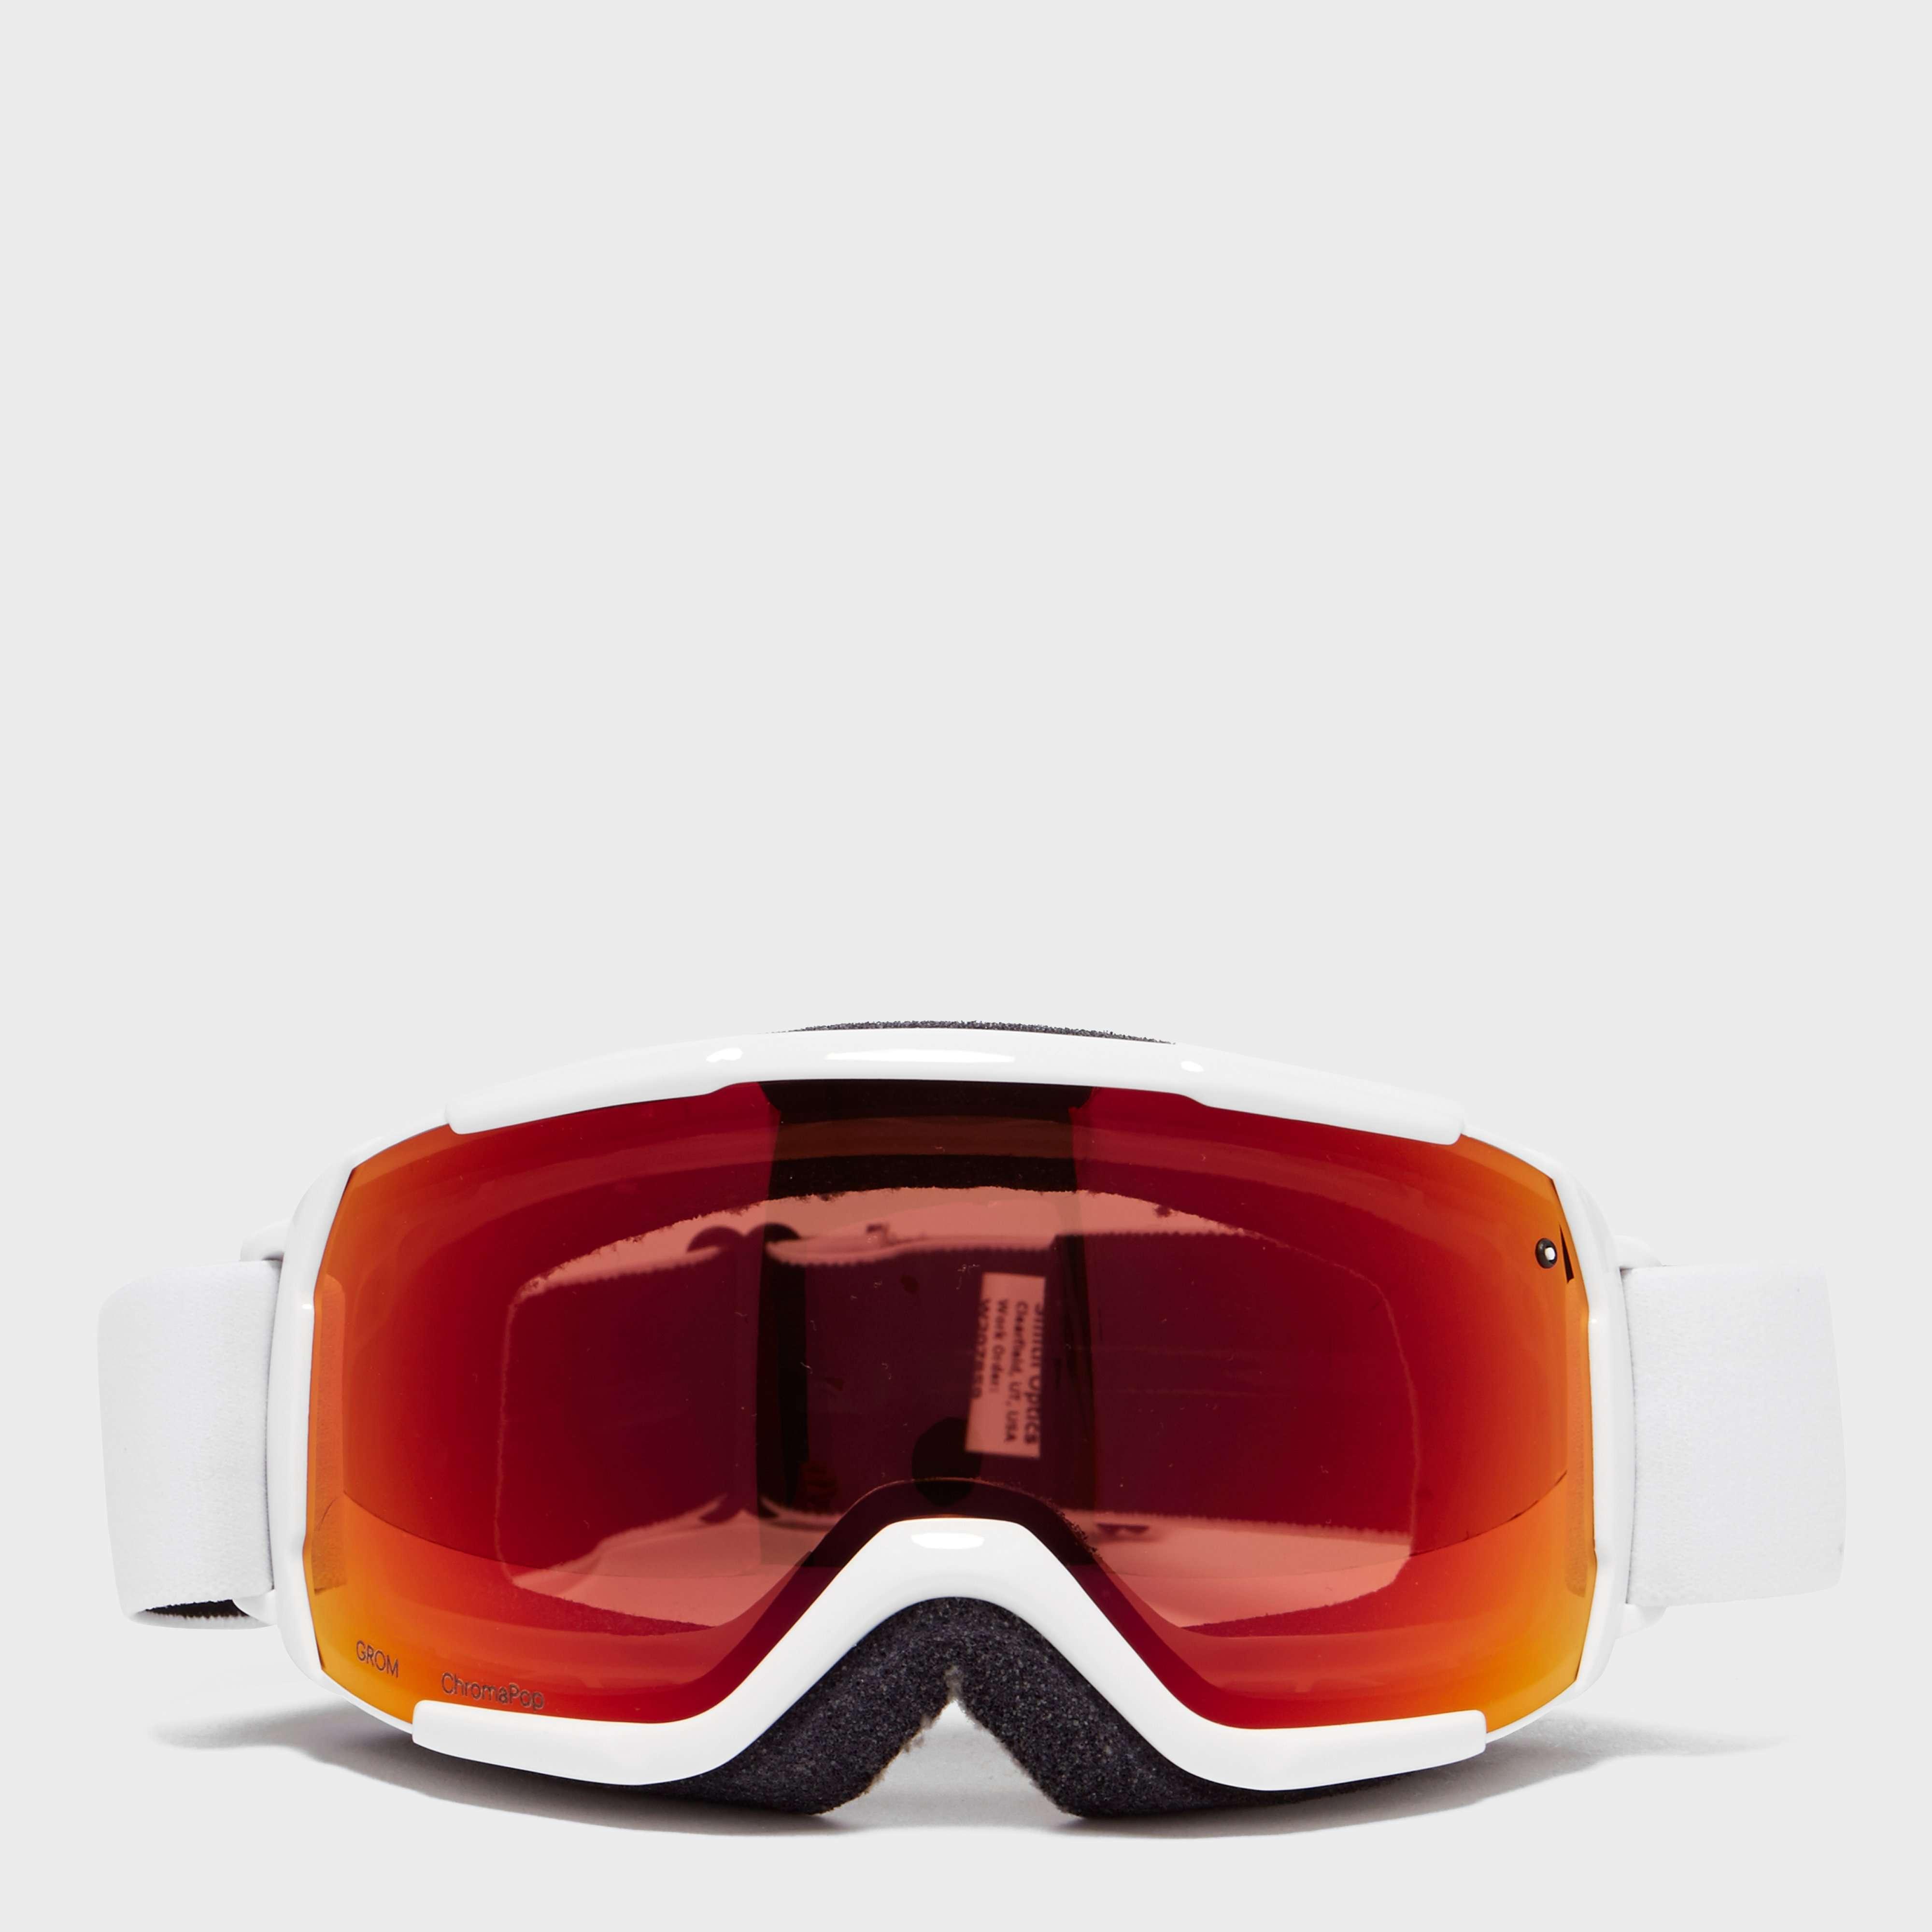 SMITH Kids Grom Ski Goggles